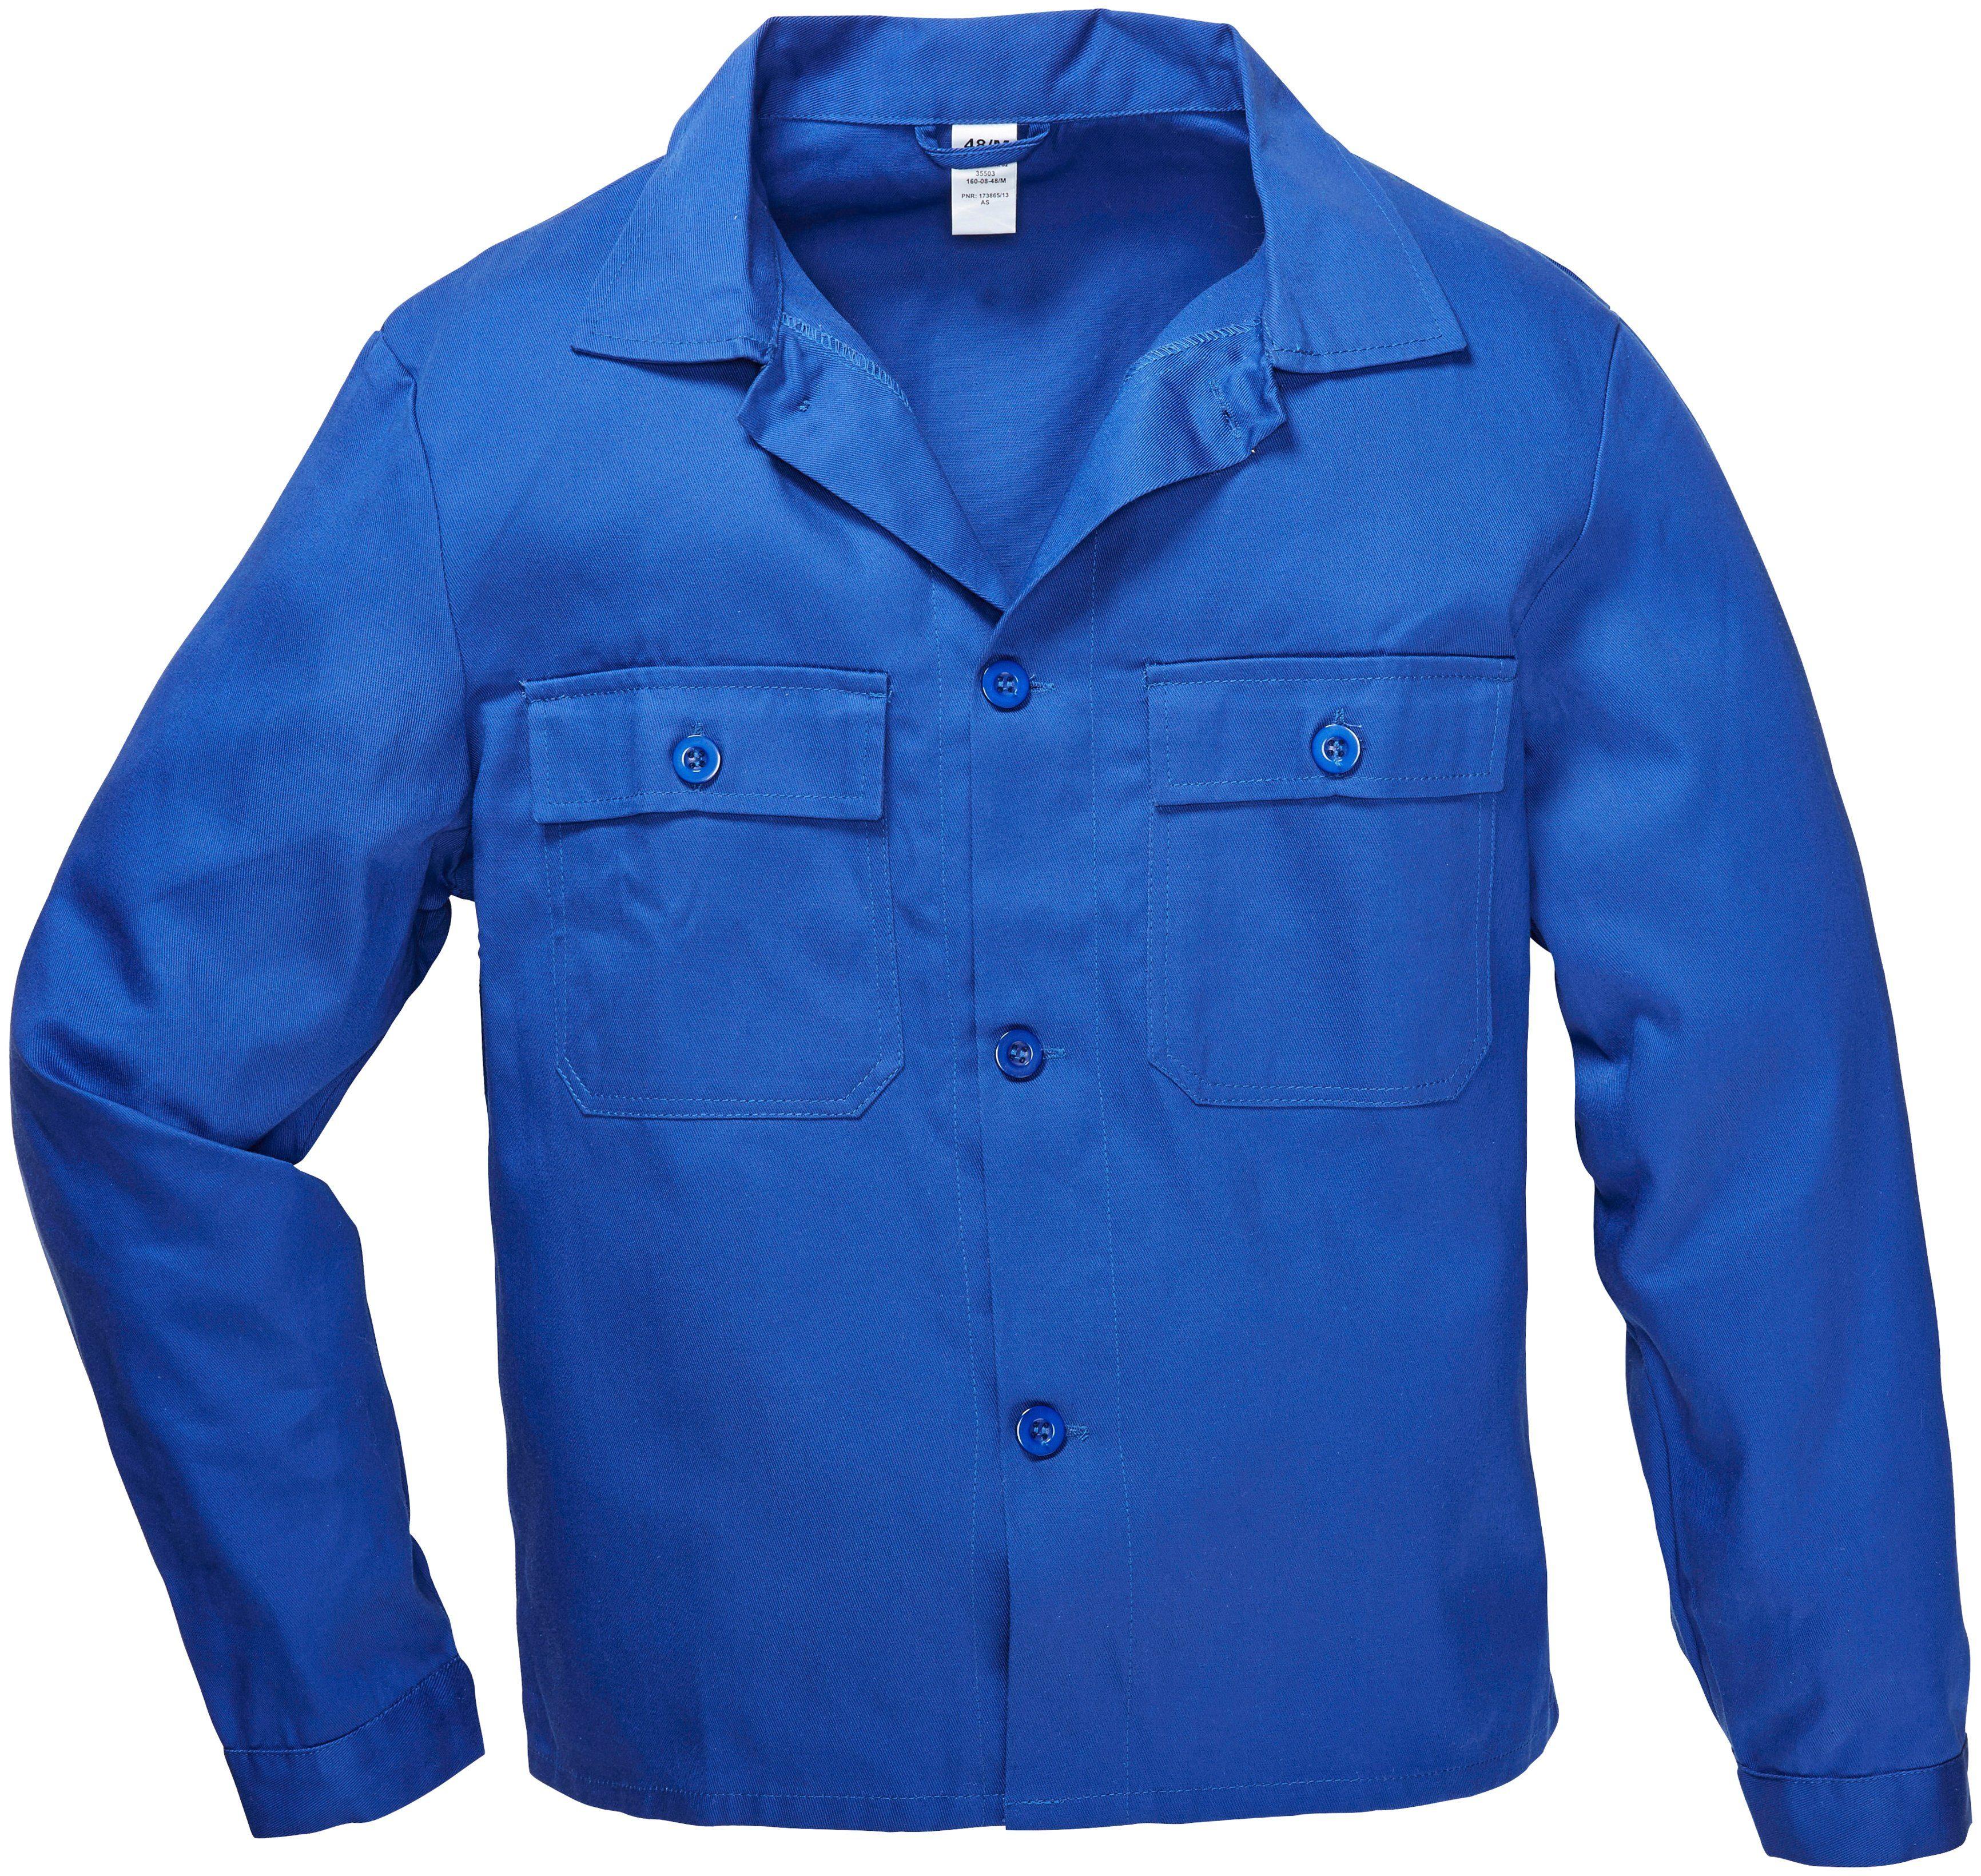 Kübler IDENTIQ cotton Jacke Arbeitsjacke Berufsjacke Herren Workwear Bundjacke